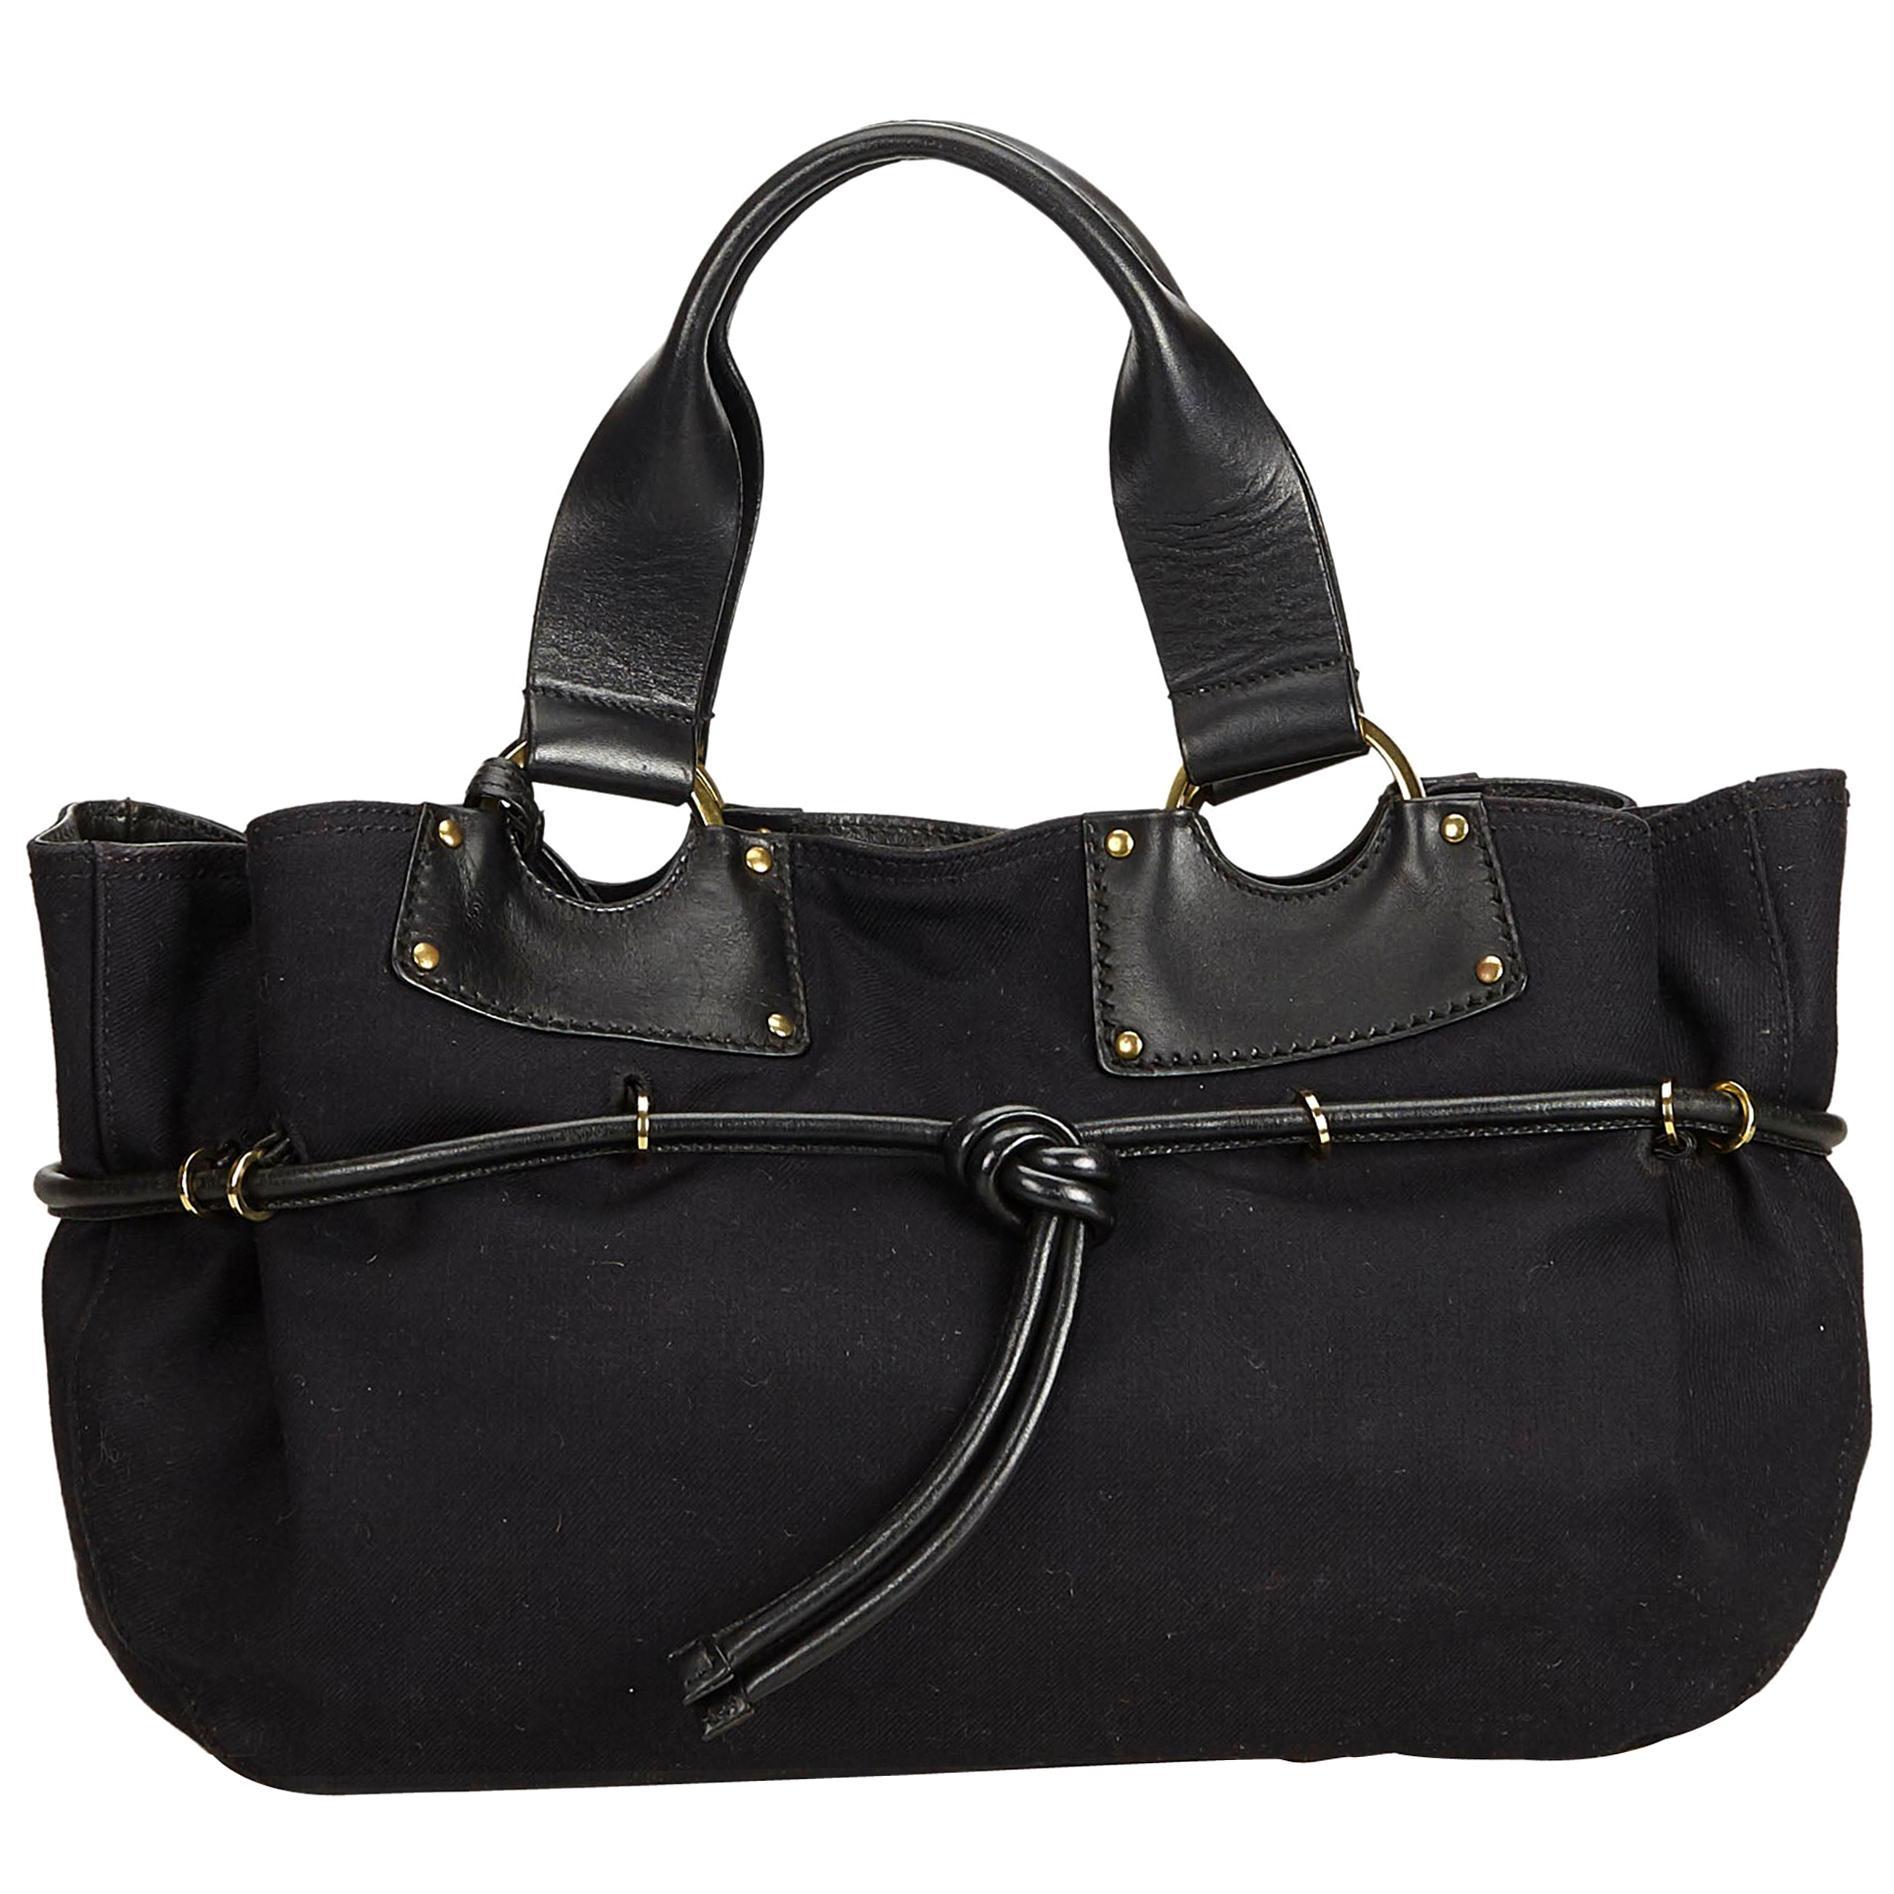 e8e05b5e Vintage Gucci Handbags and Purses - 2,286 For Sale at 1stdibs